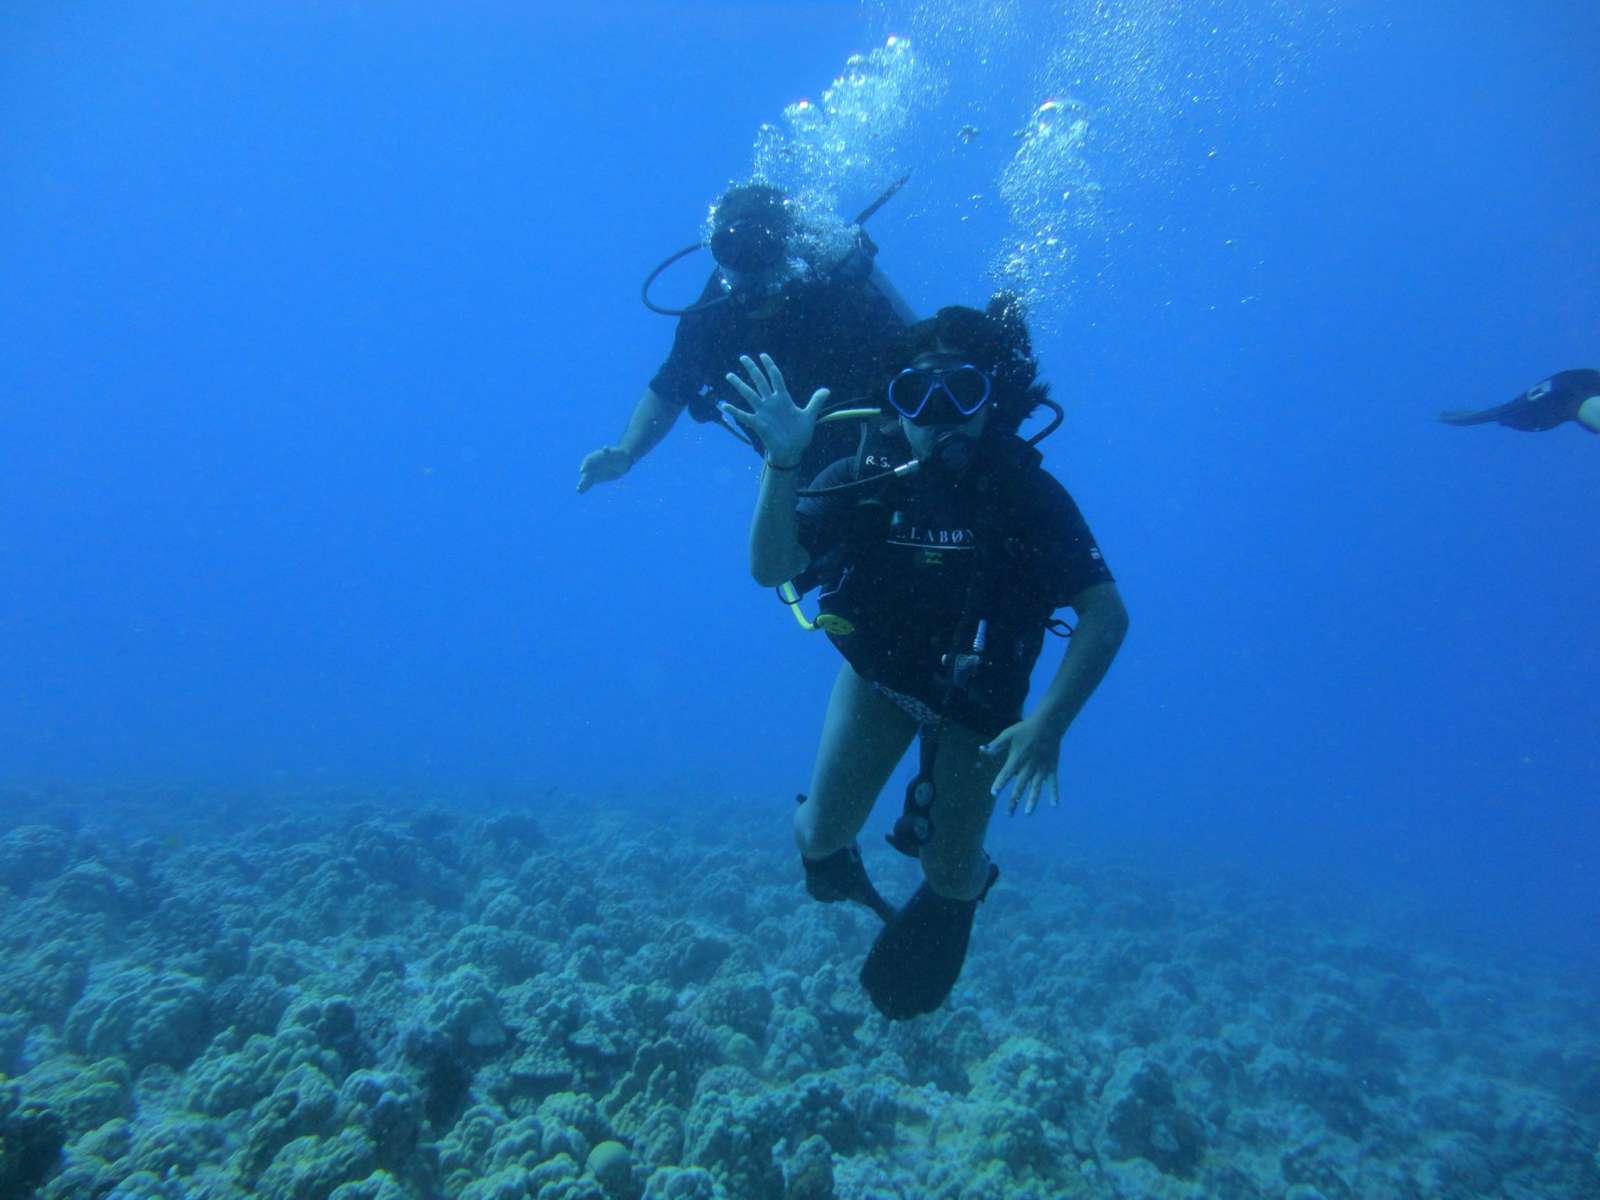 Hawaii Scuba Diving 07 07 2016